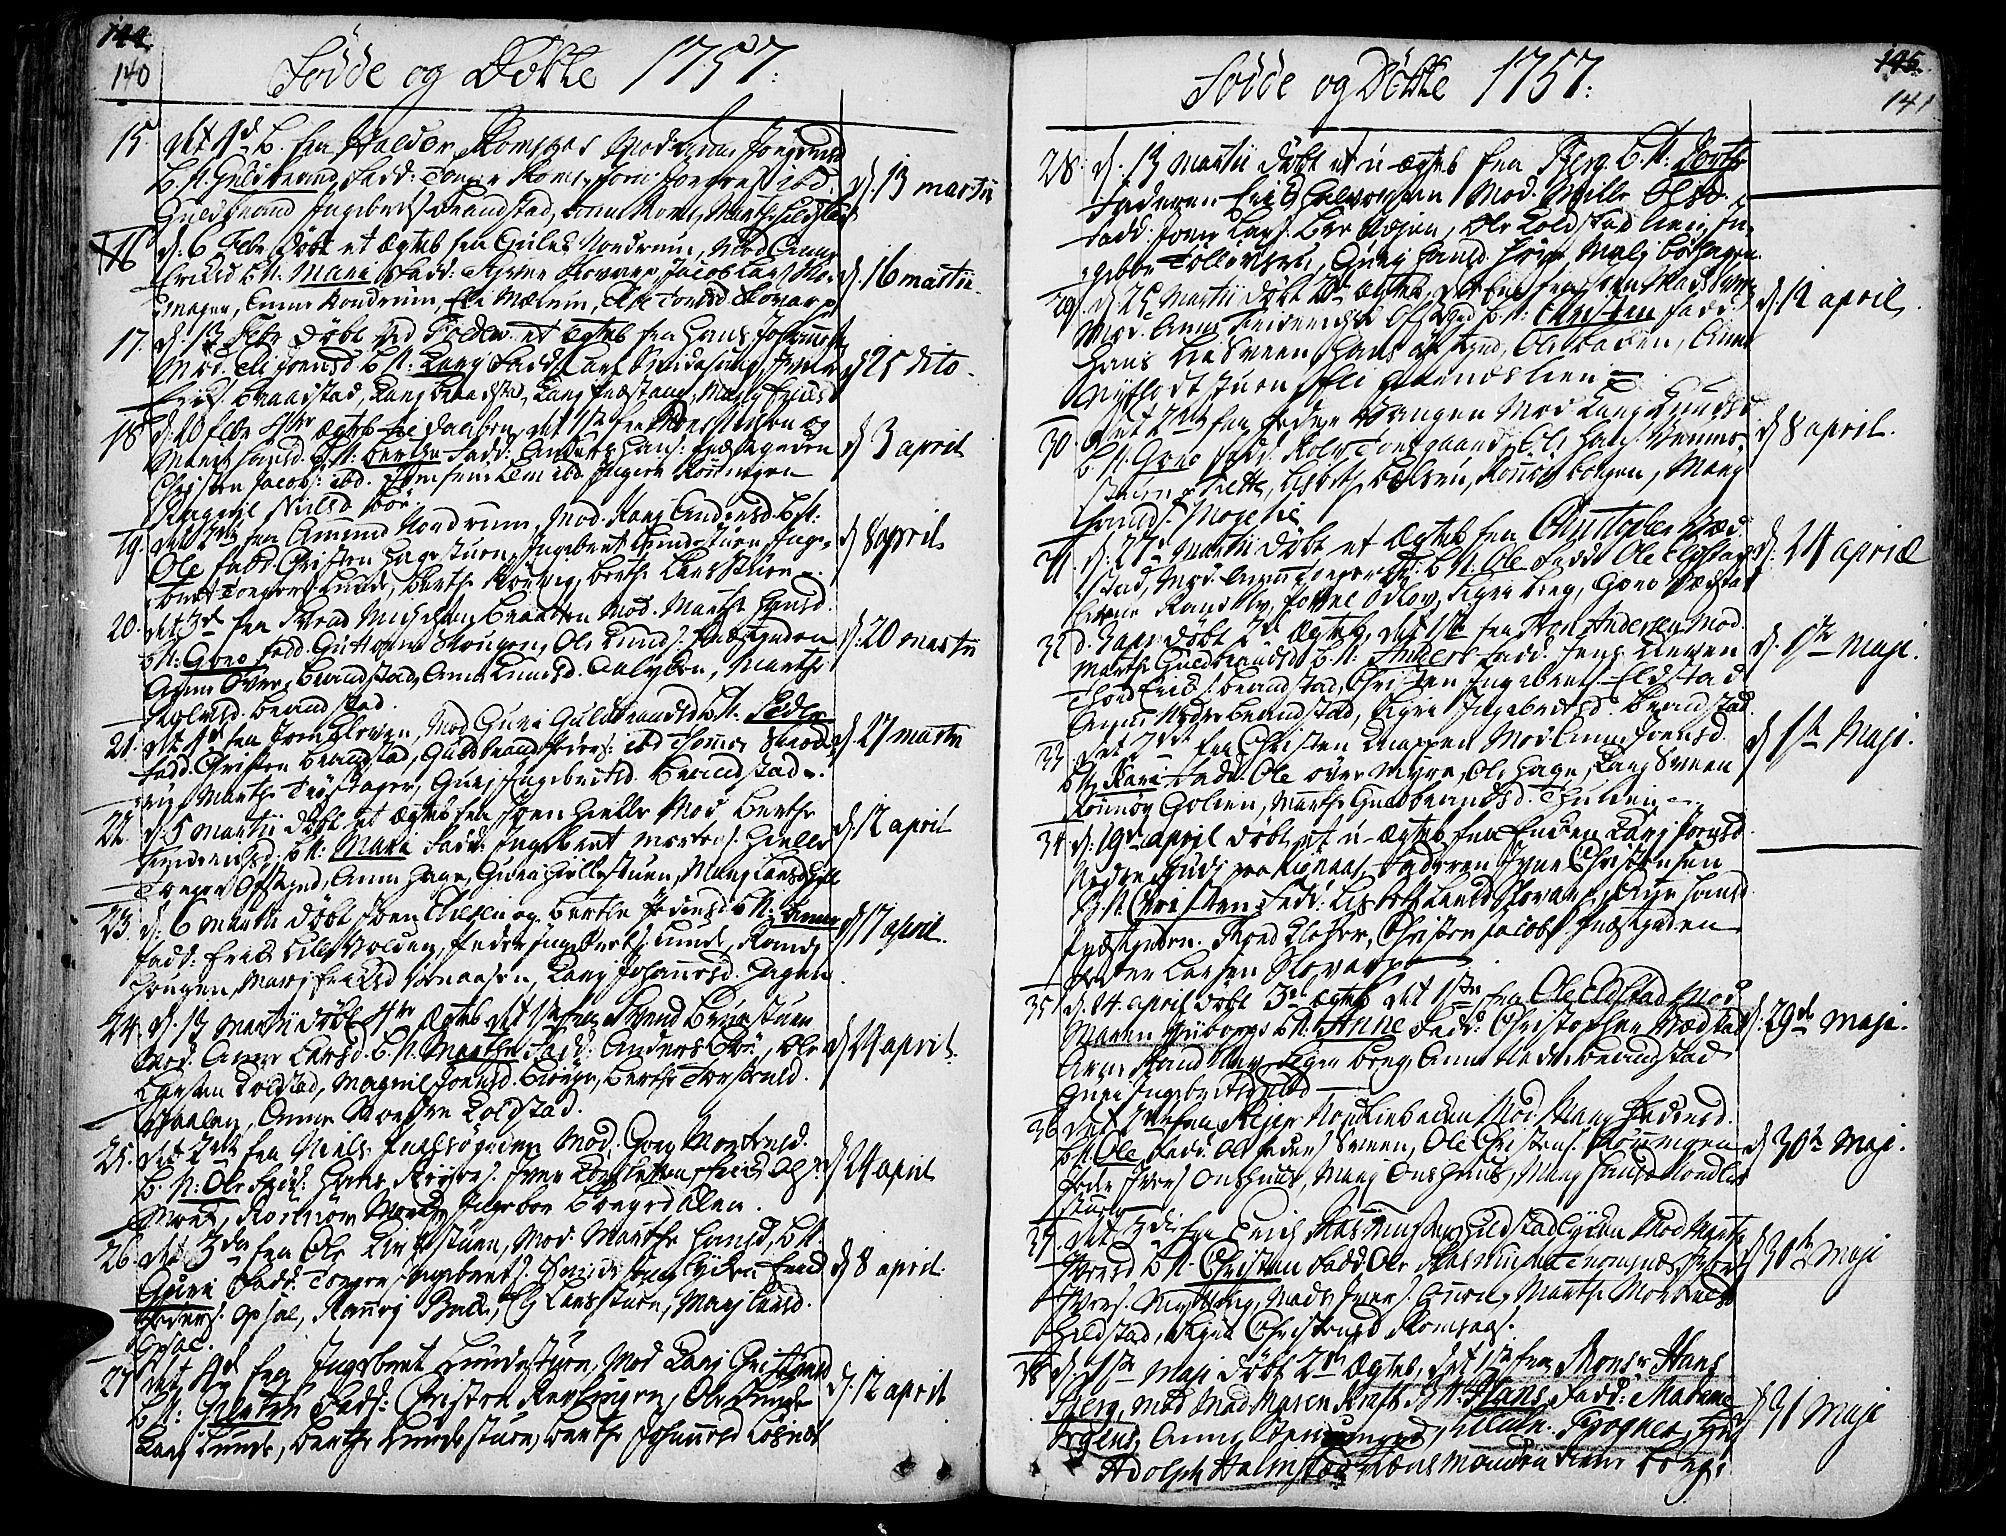 SAH, Ringebu prestekontor, Ministerialbok nr. 2, 1734-1780, s. 140-141